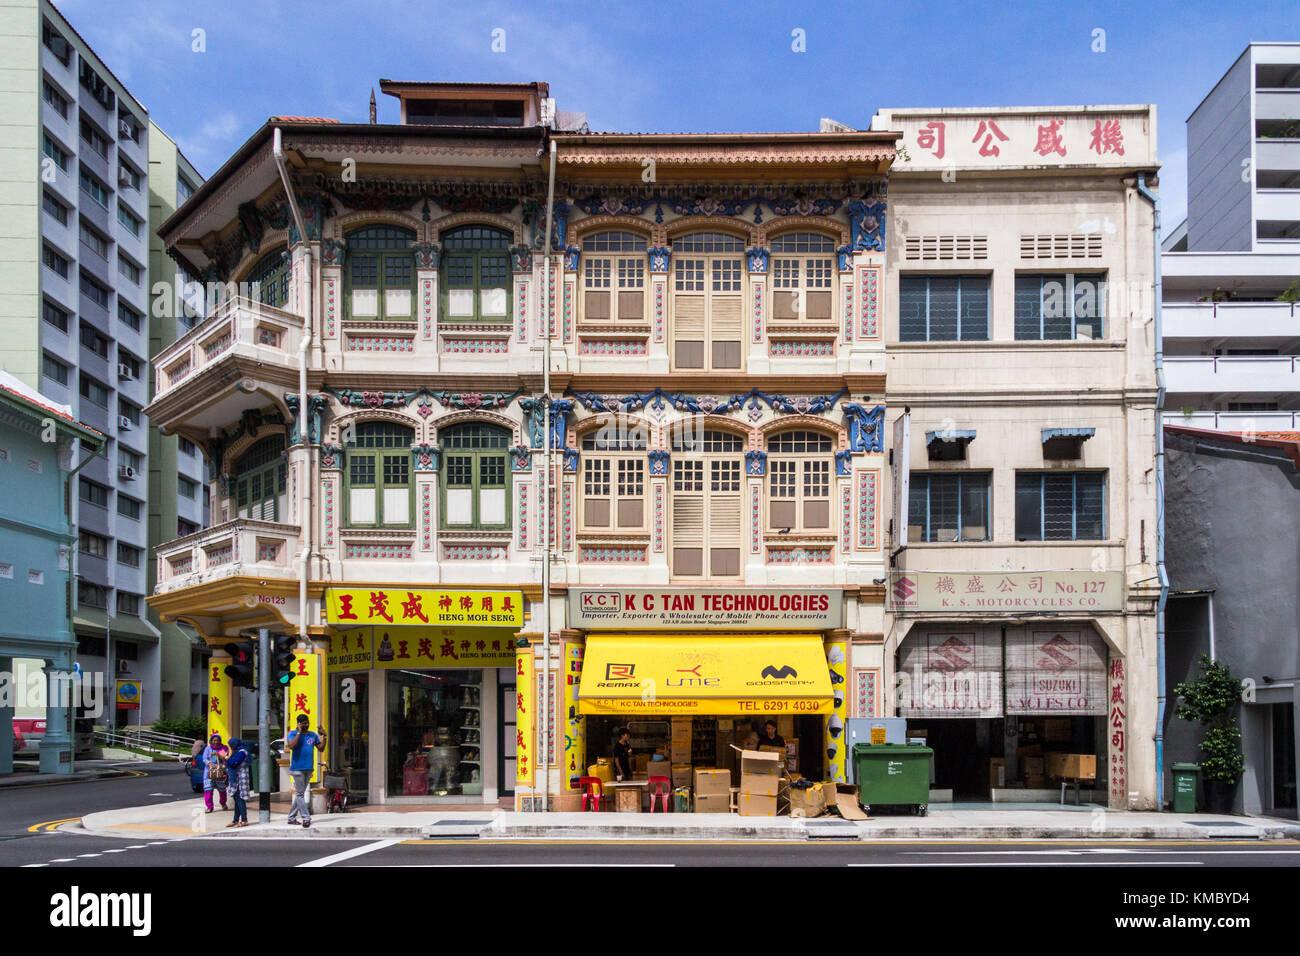 Shophouses on Jalan Besar, Rochor, Singapore - Stock Image